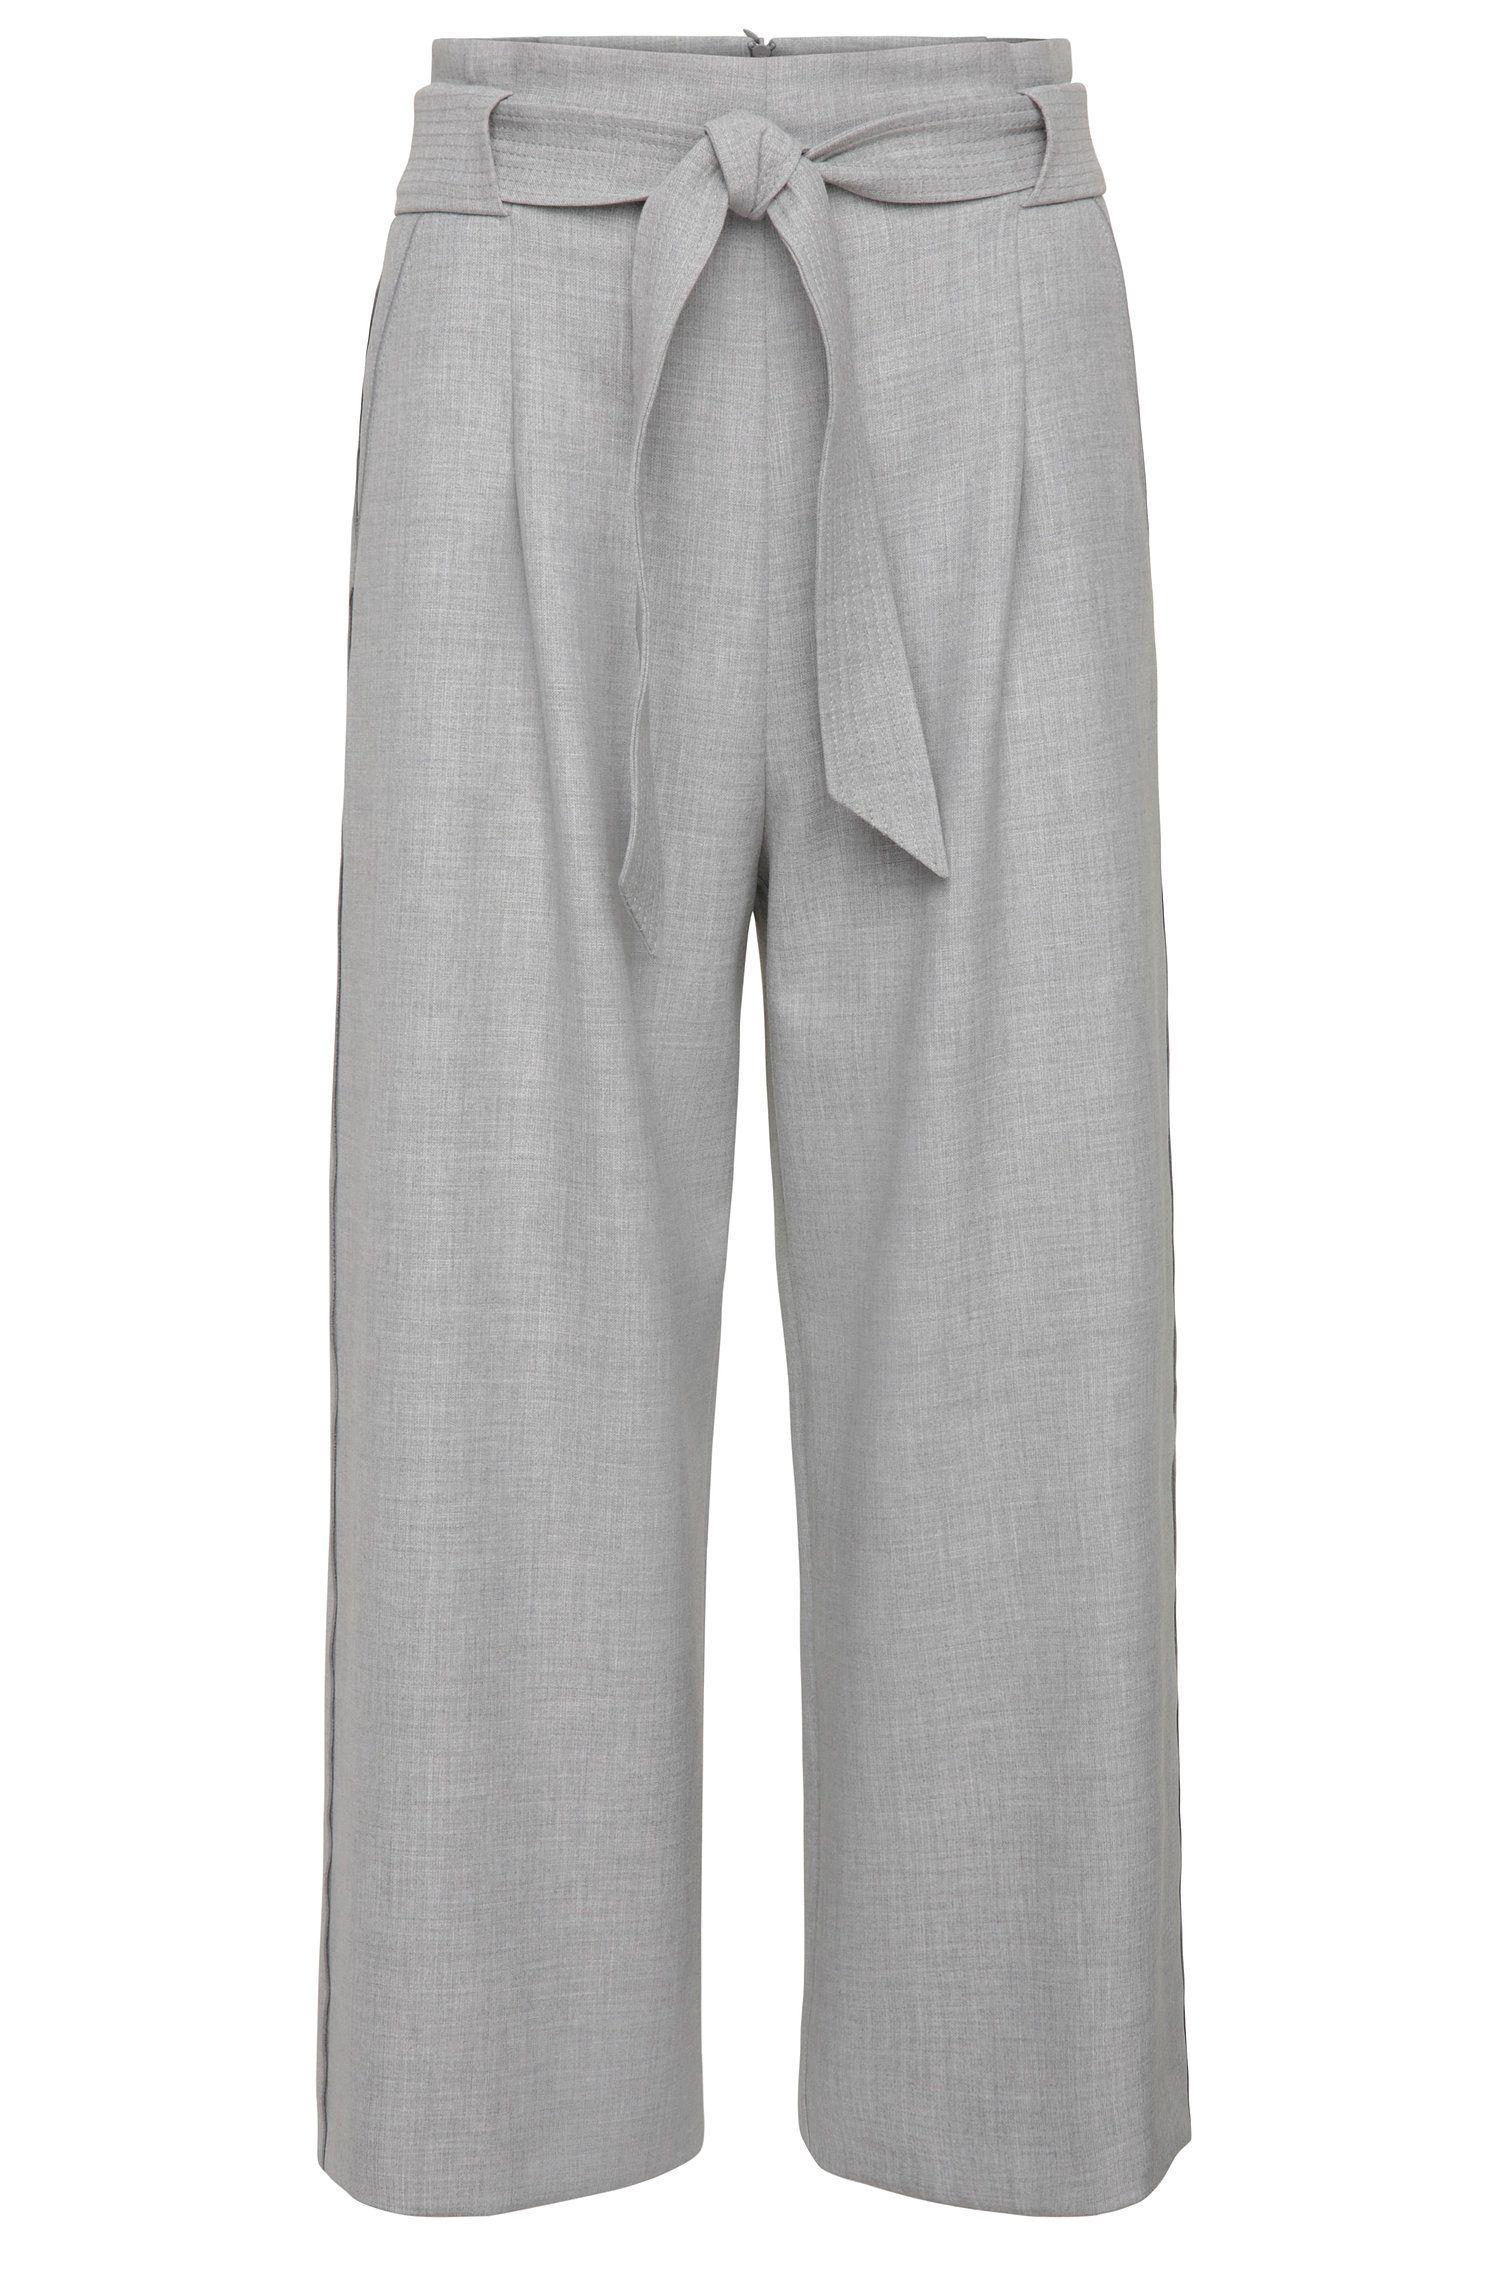 Falda pantalón en mezcla de materiales elásticos: 'Sistina'